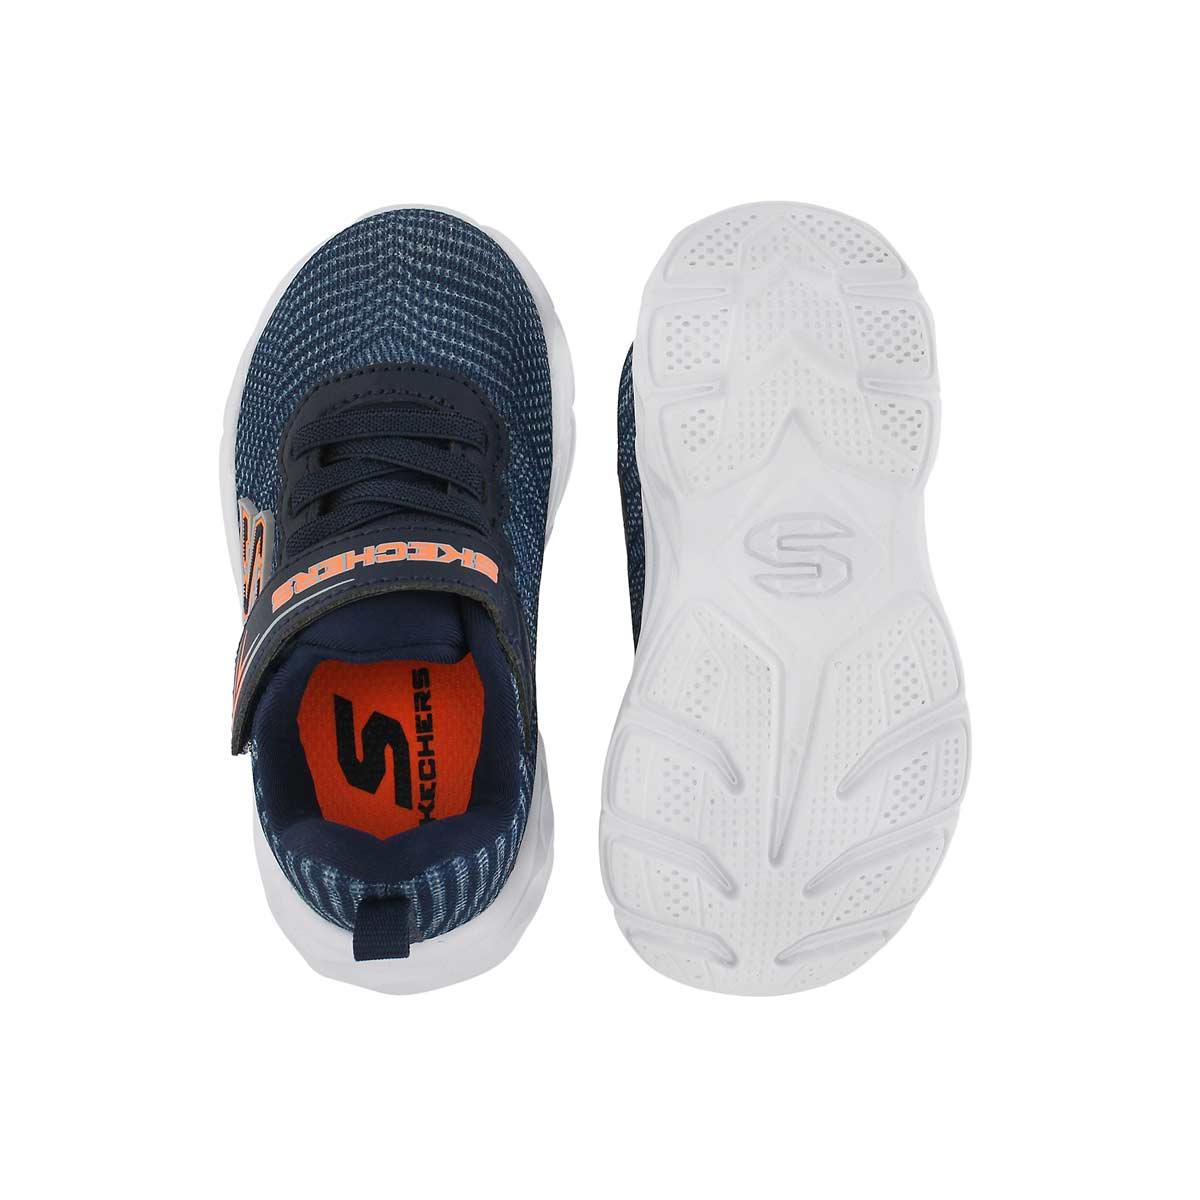 Infs-b Eclipsor nvy/slvr sneaker